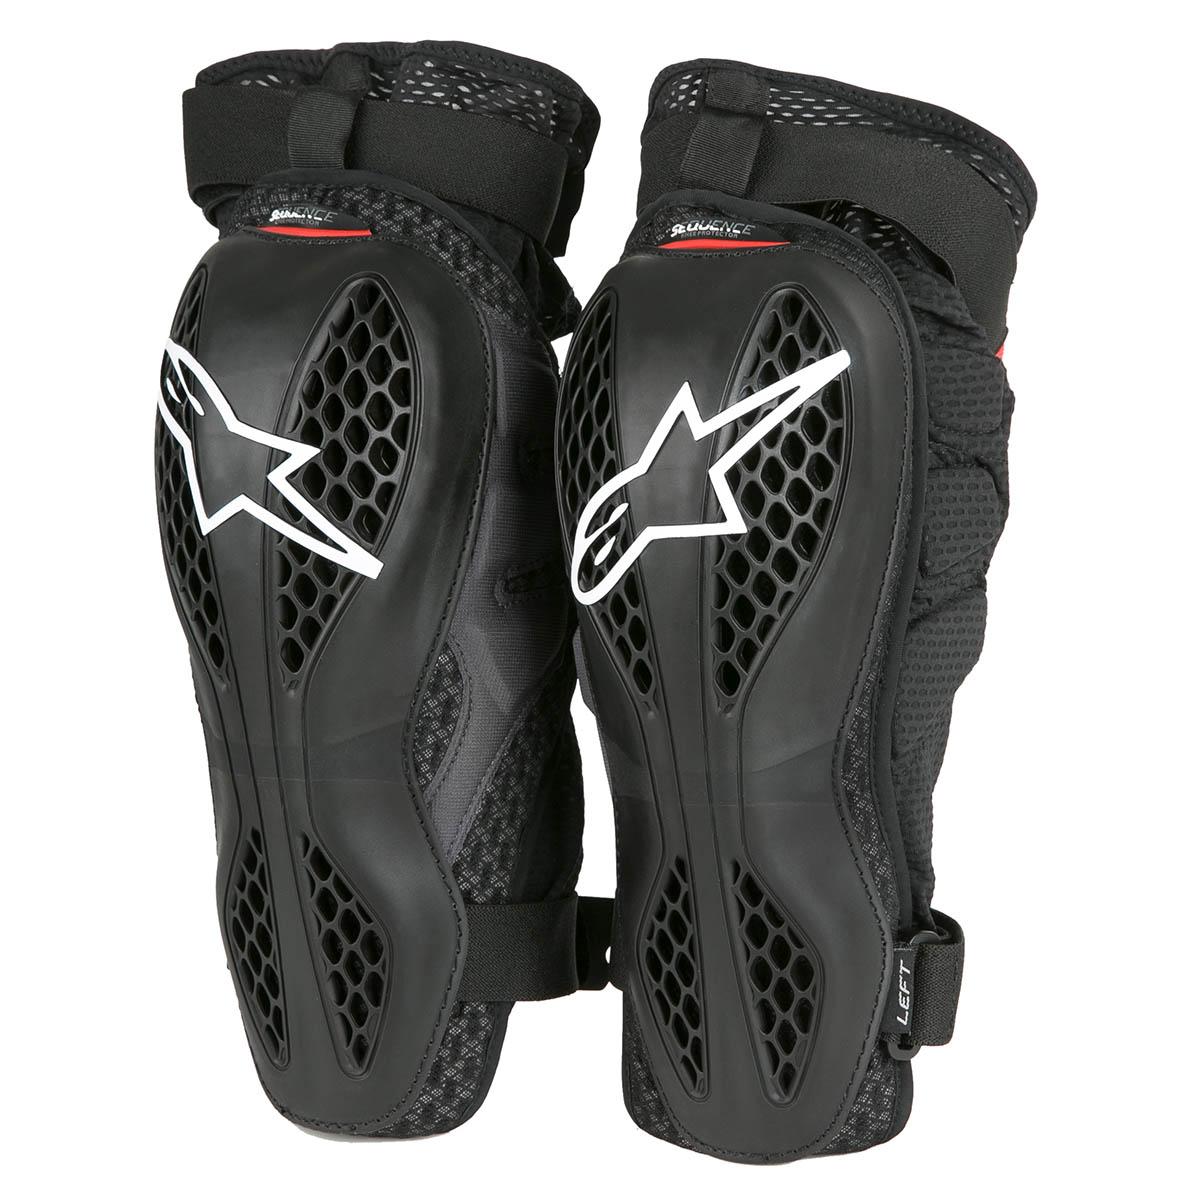 Protection//Guard Knee MX/ L//XL, Black /Pair Alpinestars Sequence Black-Red